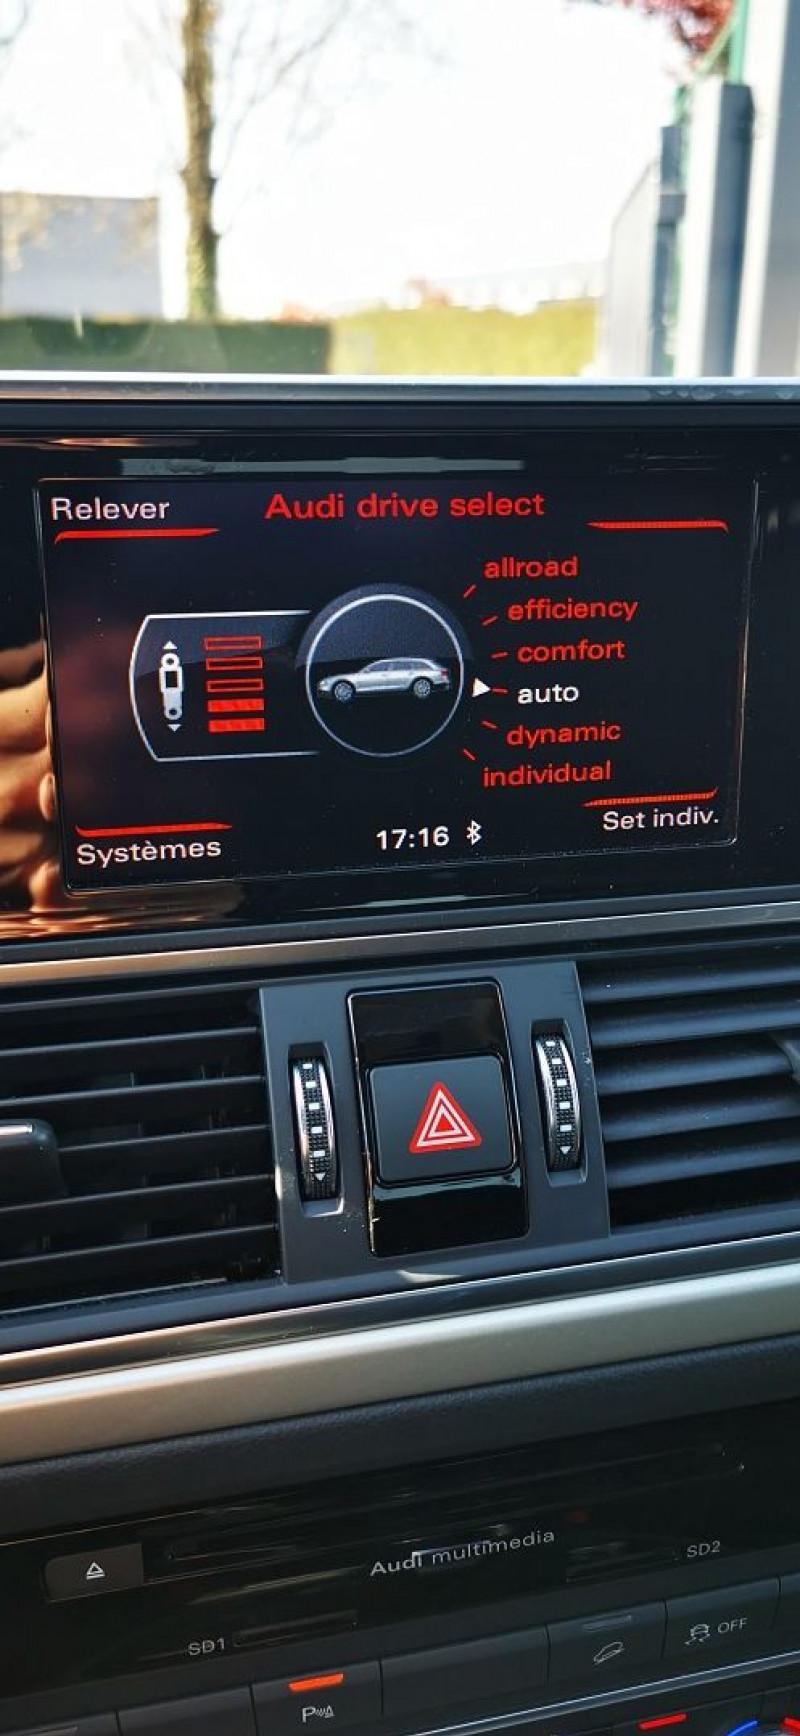 Photo 20 de l'offre de AUDI A6 ALLROAD 3.0 V6 BITDI 320CH AMBITION LUXE QUATTRO TIPTRONIC à 41490€ chez Maximum Automobiles